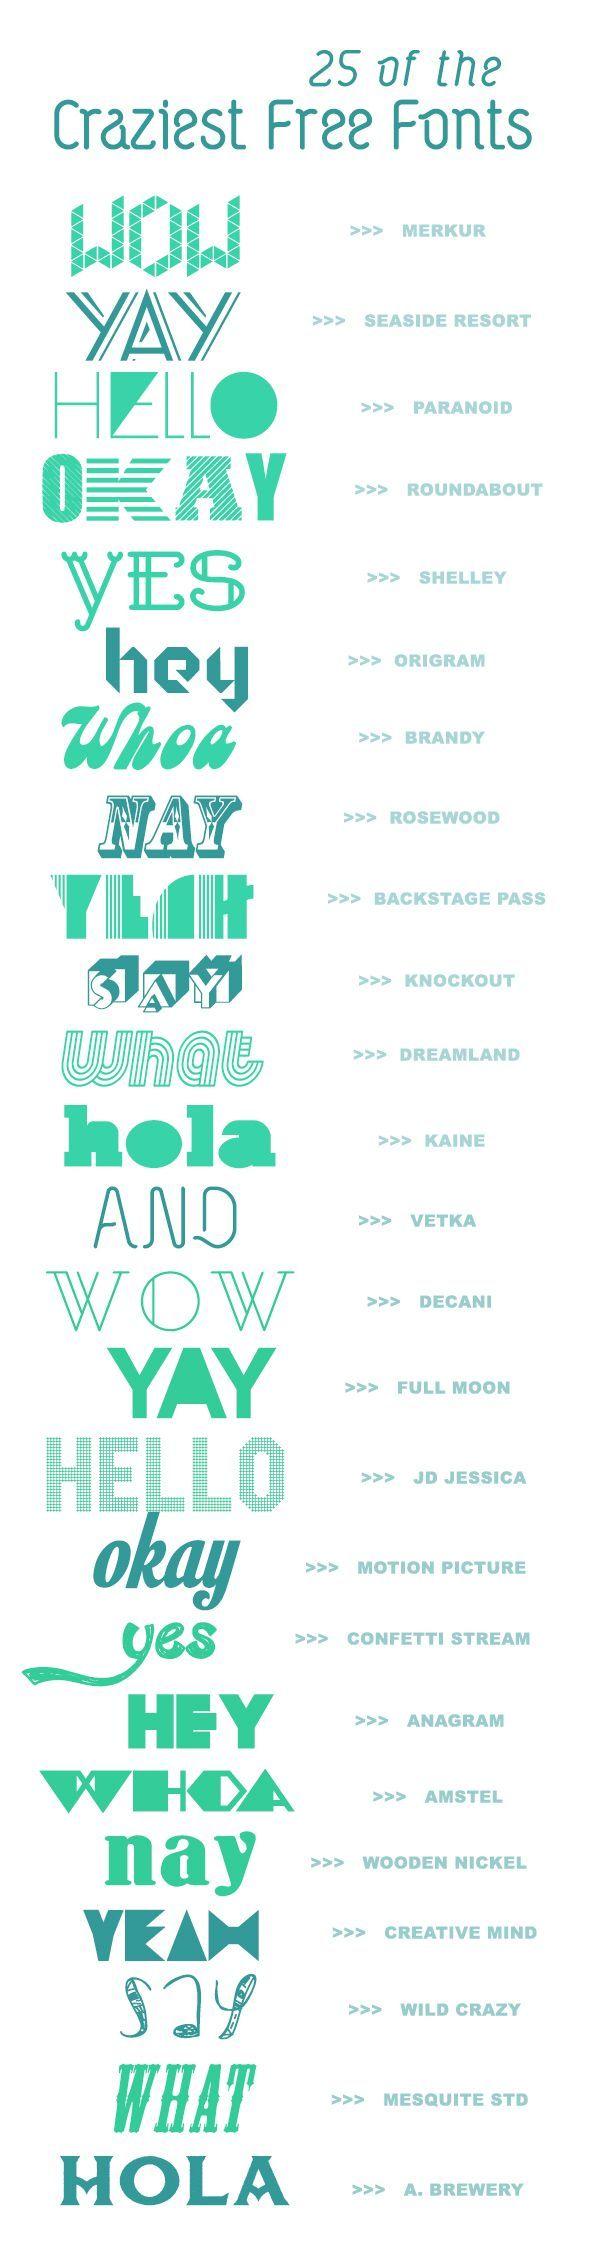 25 Crazy Creative Fonts Free! |  A Subtle Revelry (8.28.13)